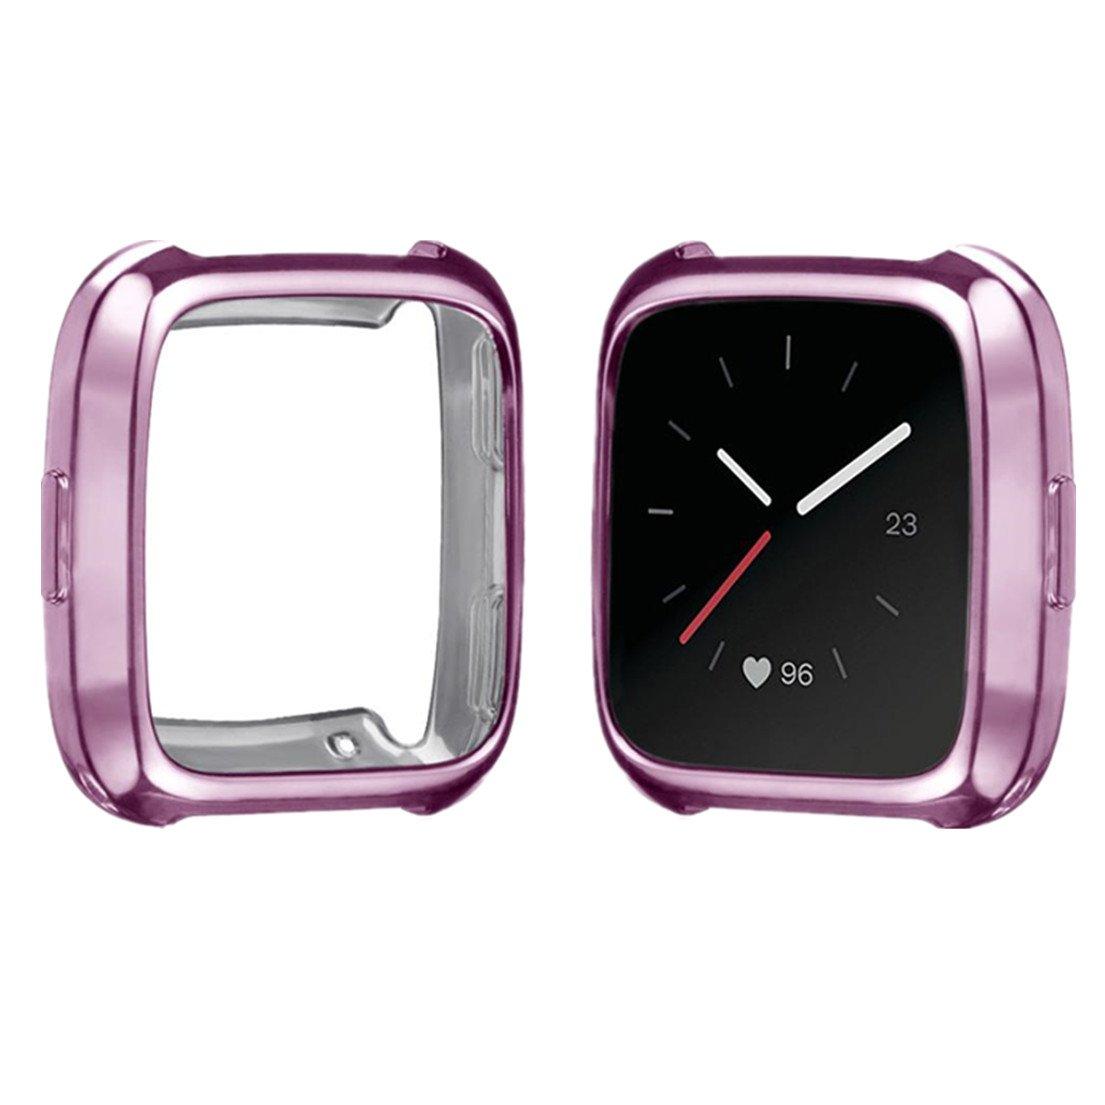 Alonea ACCESSORY メンズ Purple C❤️ Purple C❤️ B07CXF2837